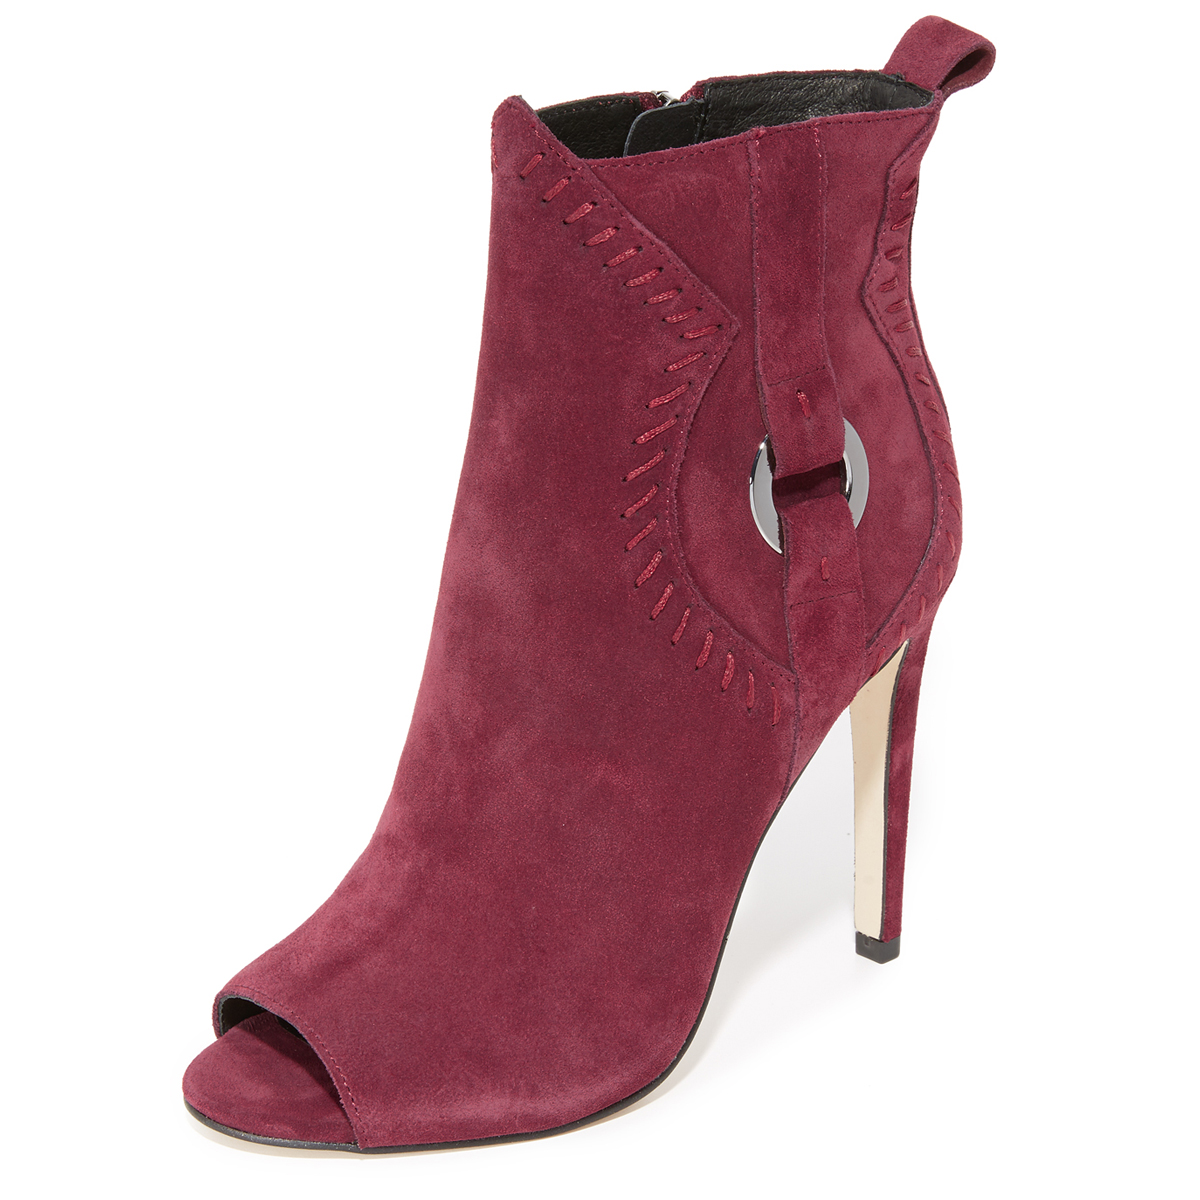 Rebecca Minkoff Suede Women's Ridley Suede Minkoff Peep Toe Booties d1eabf